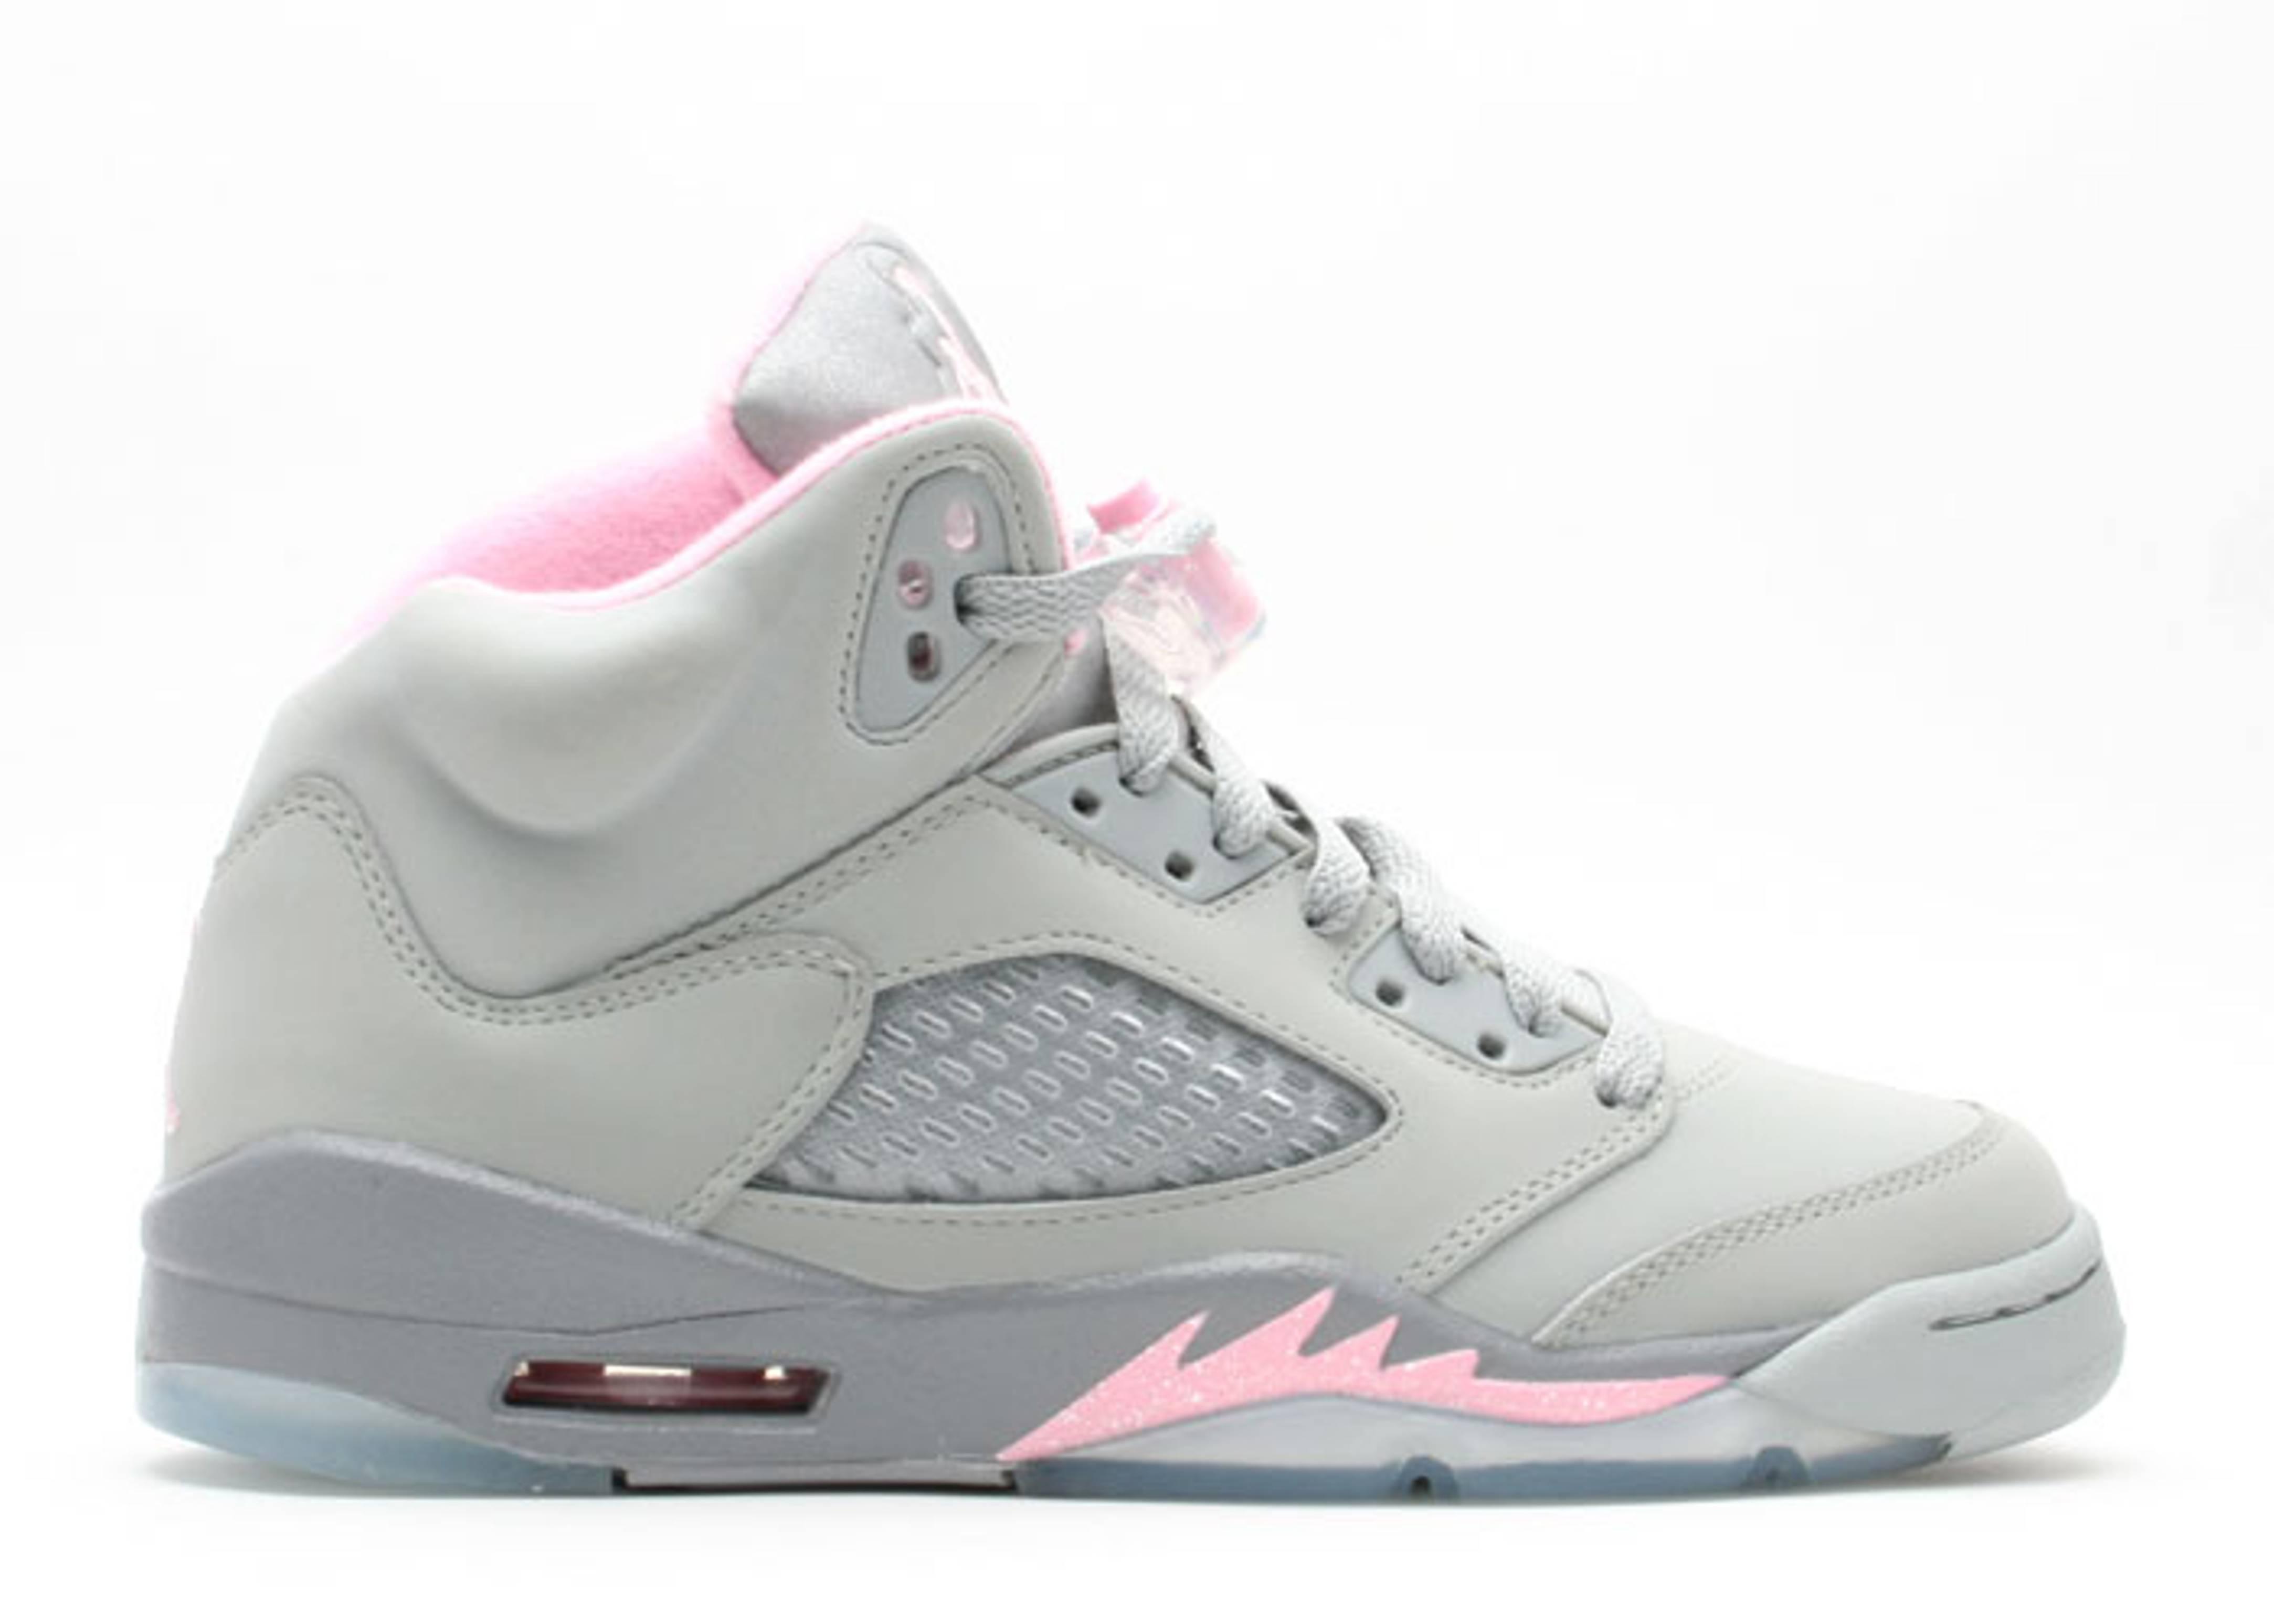 7313cf3bf82 Air Jordan 5 Retro (gs) - Air Jordan - 134092 061 - silver/shy pink ...